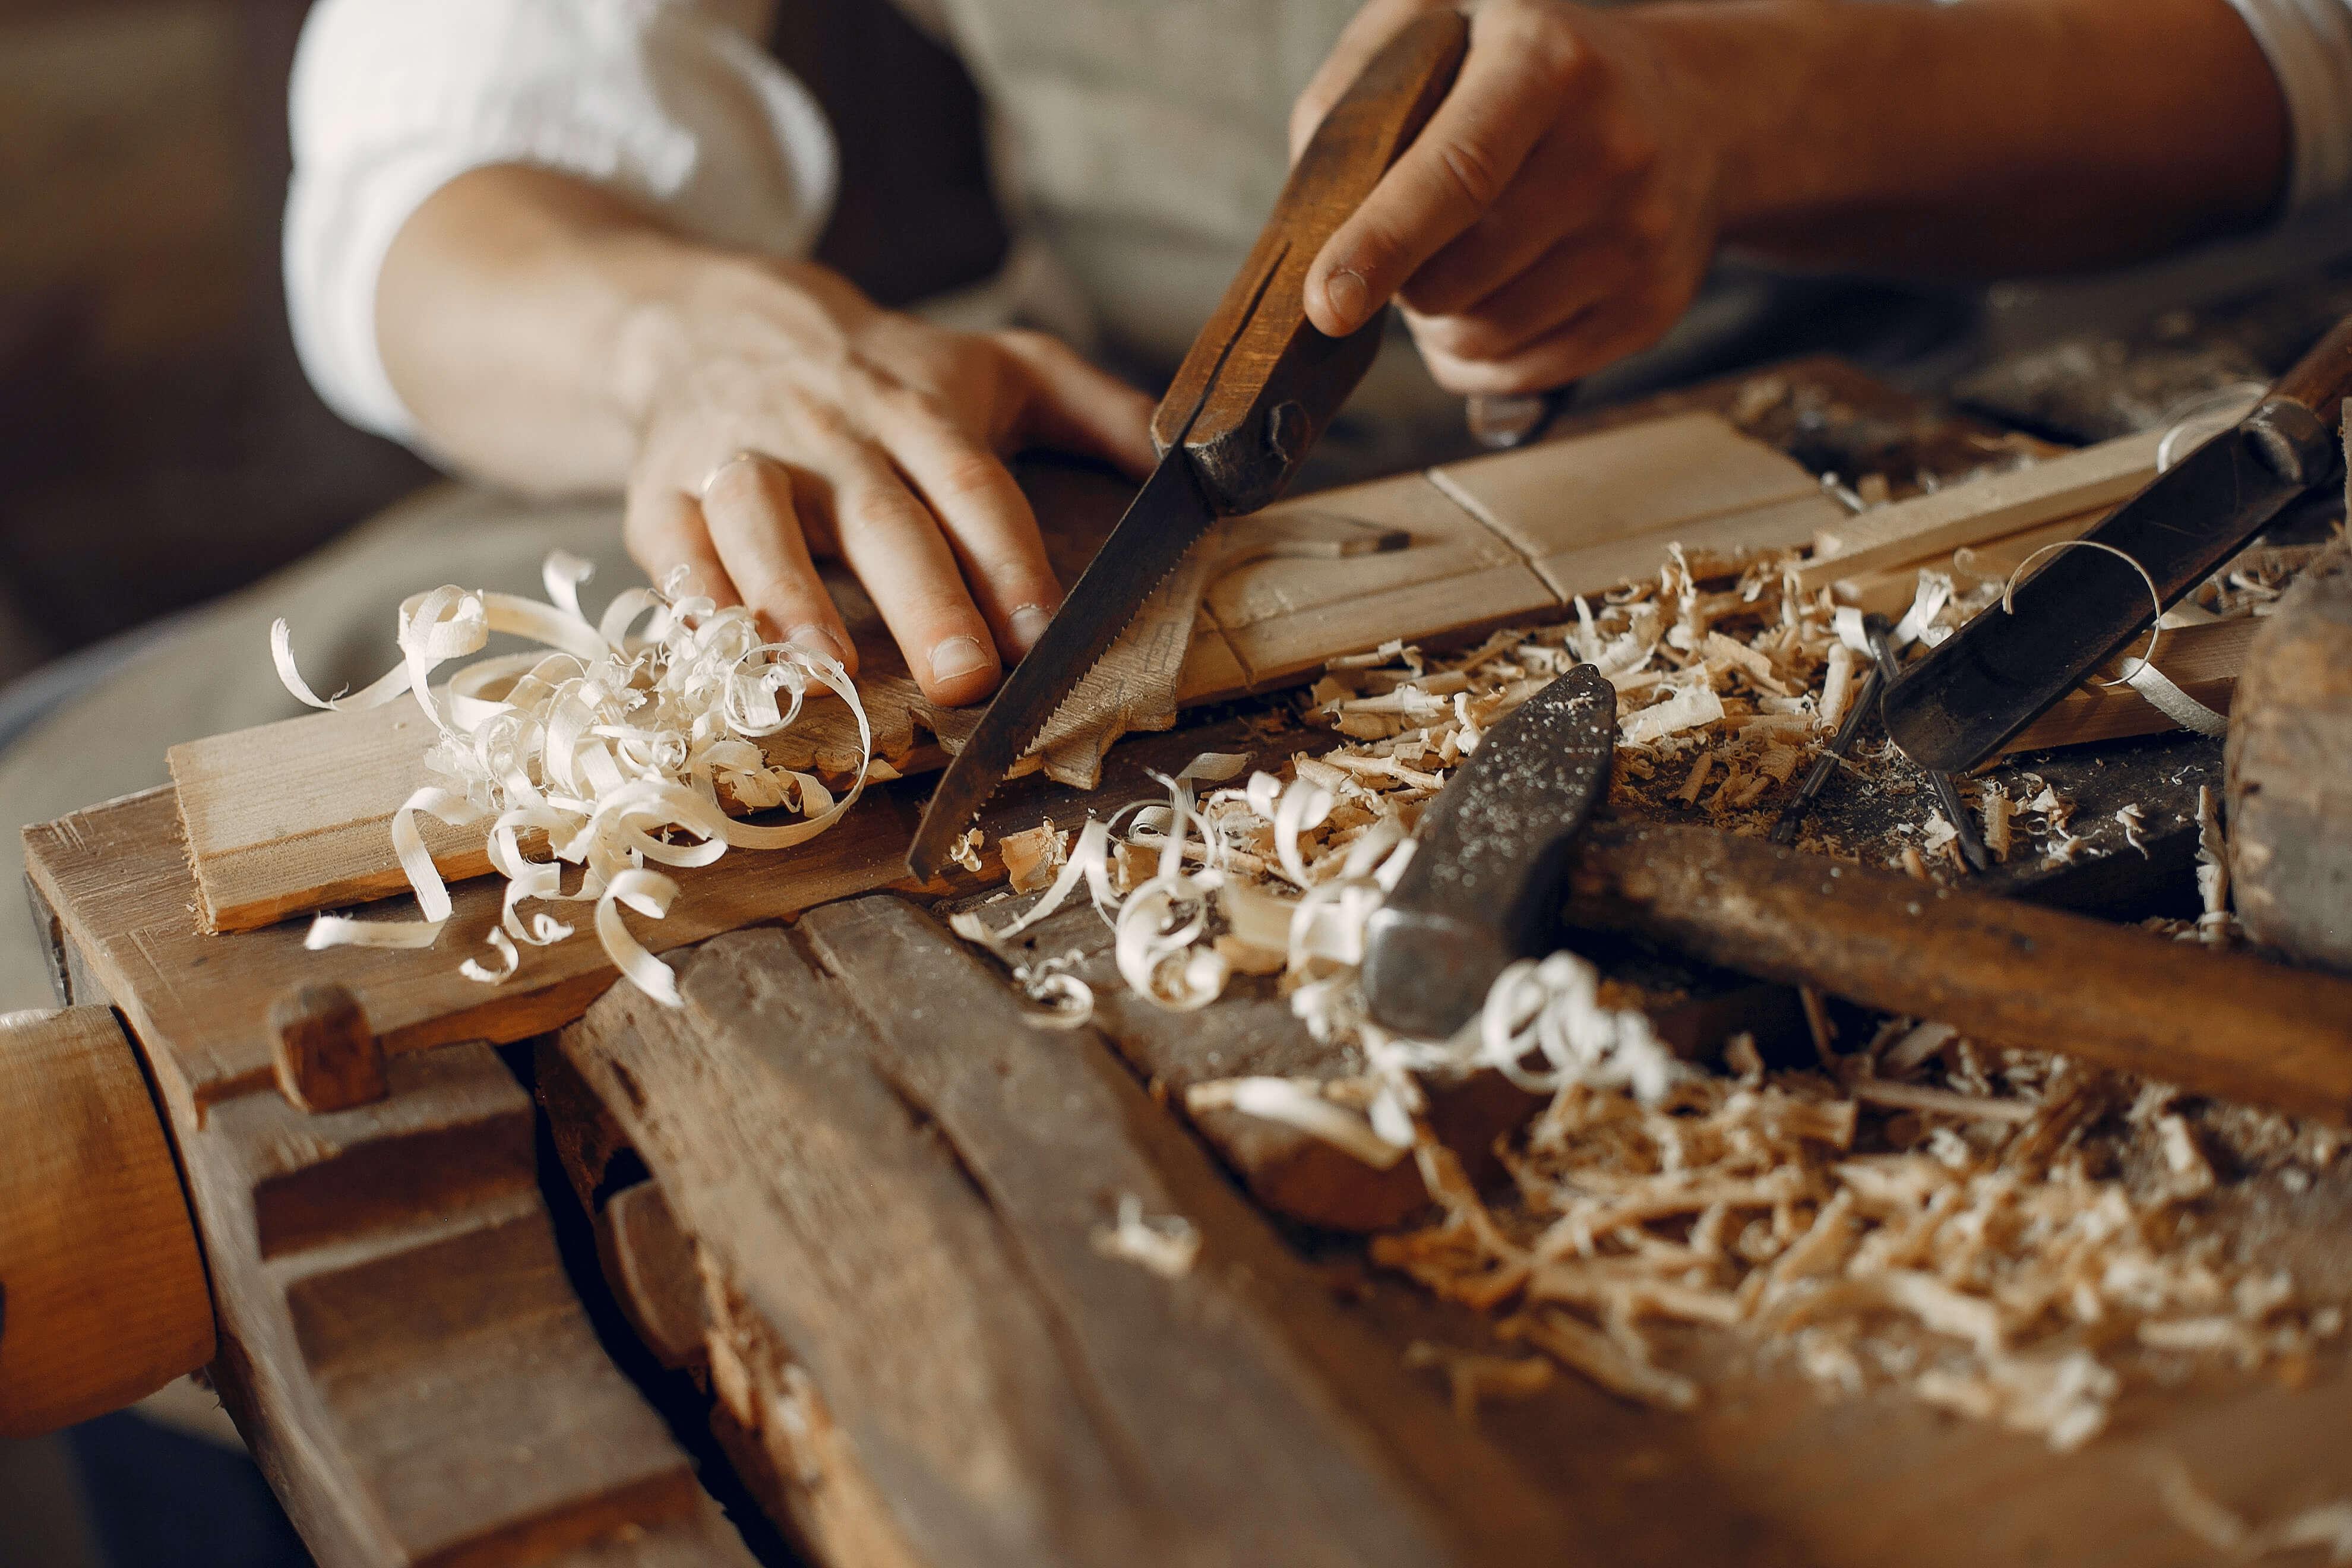 handsome-carpenter-working-with-wood-1.jpg